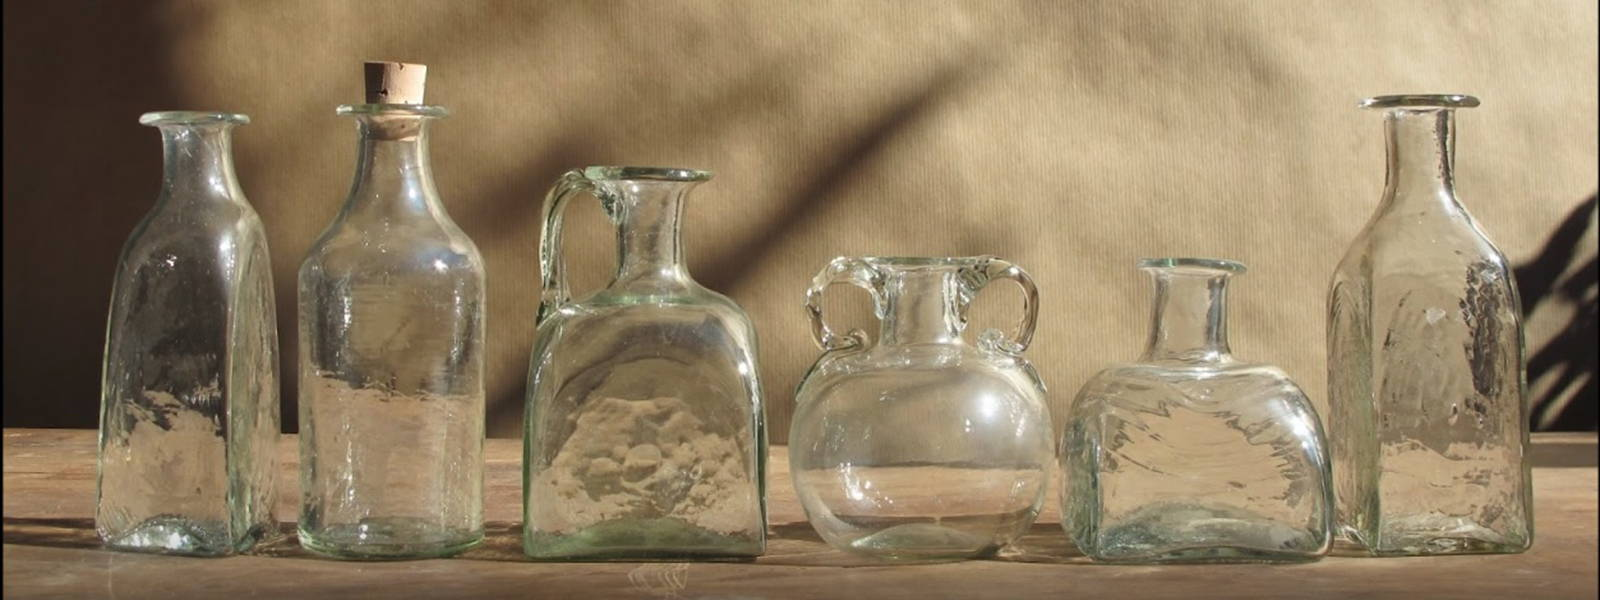 La Soufflerie Glass Vases display